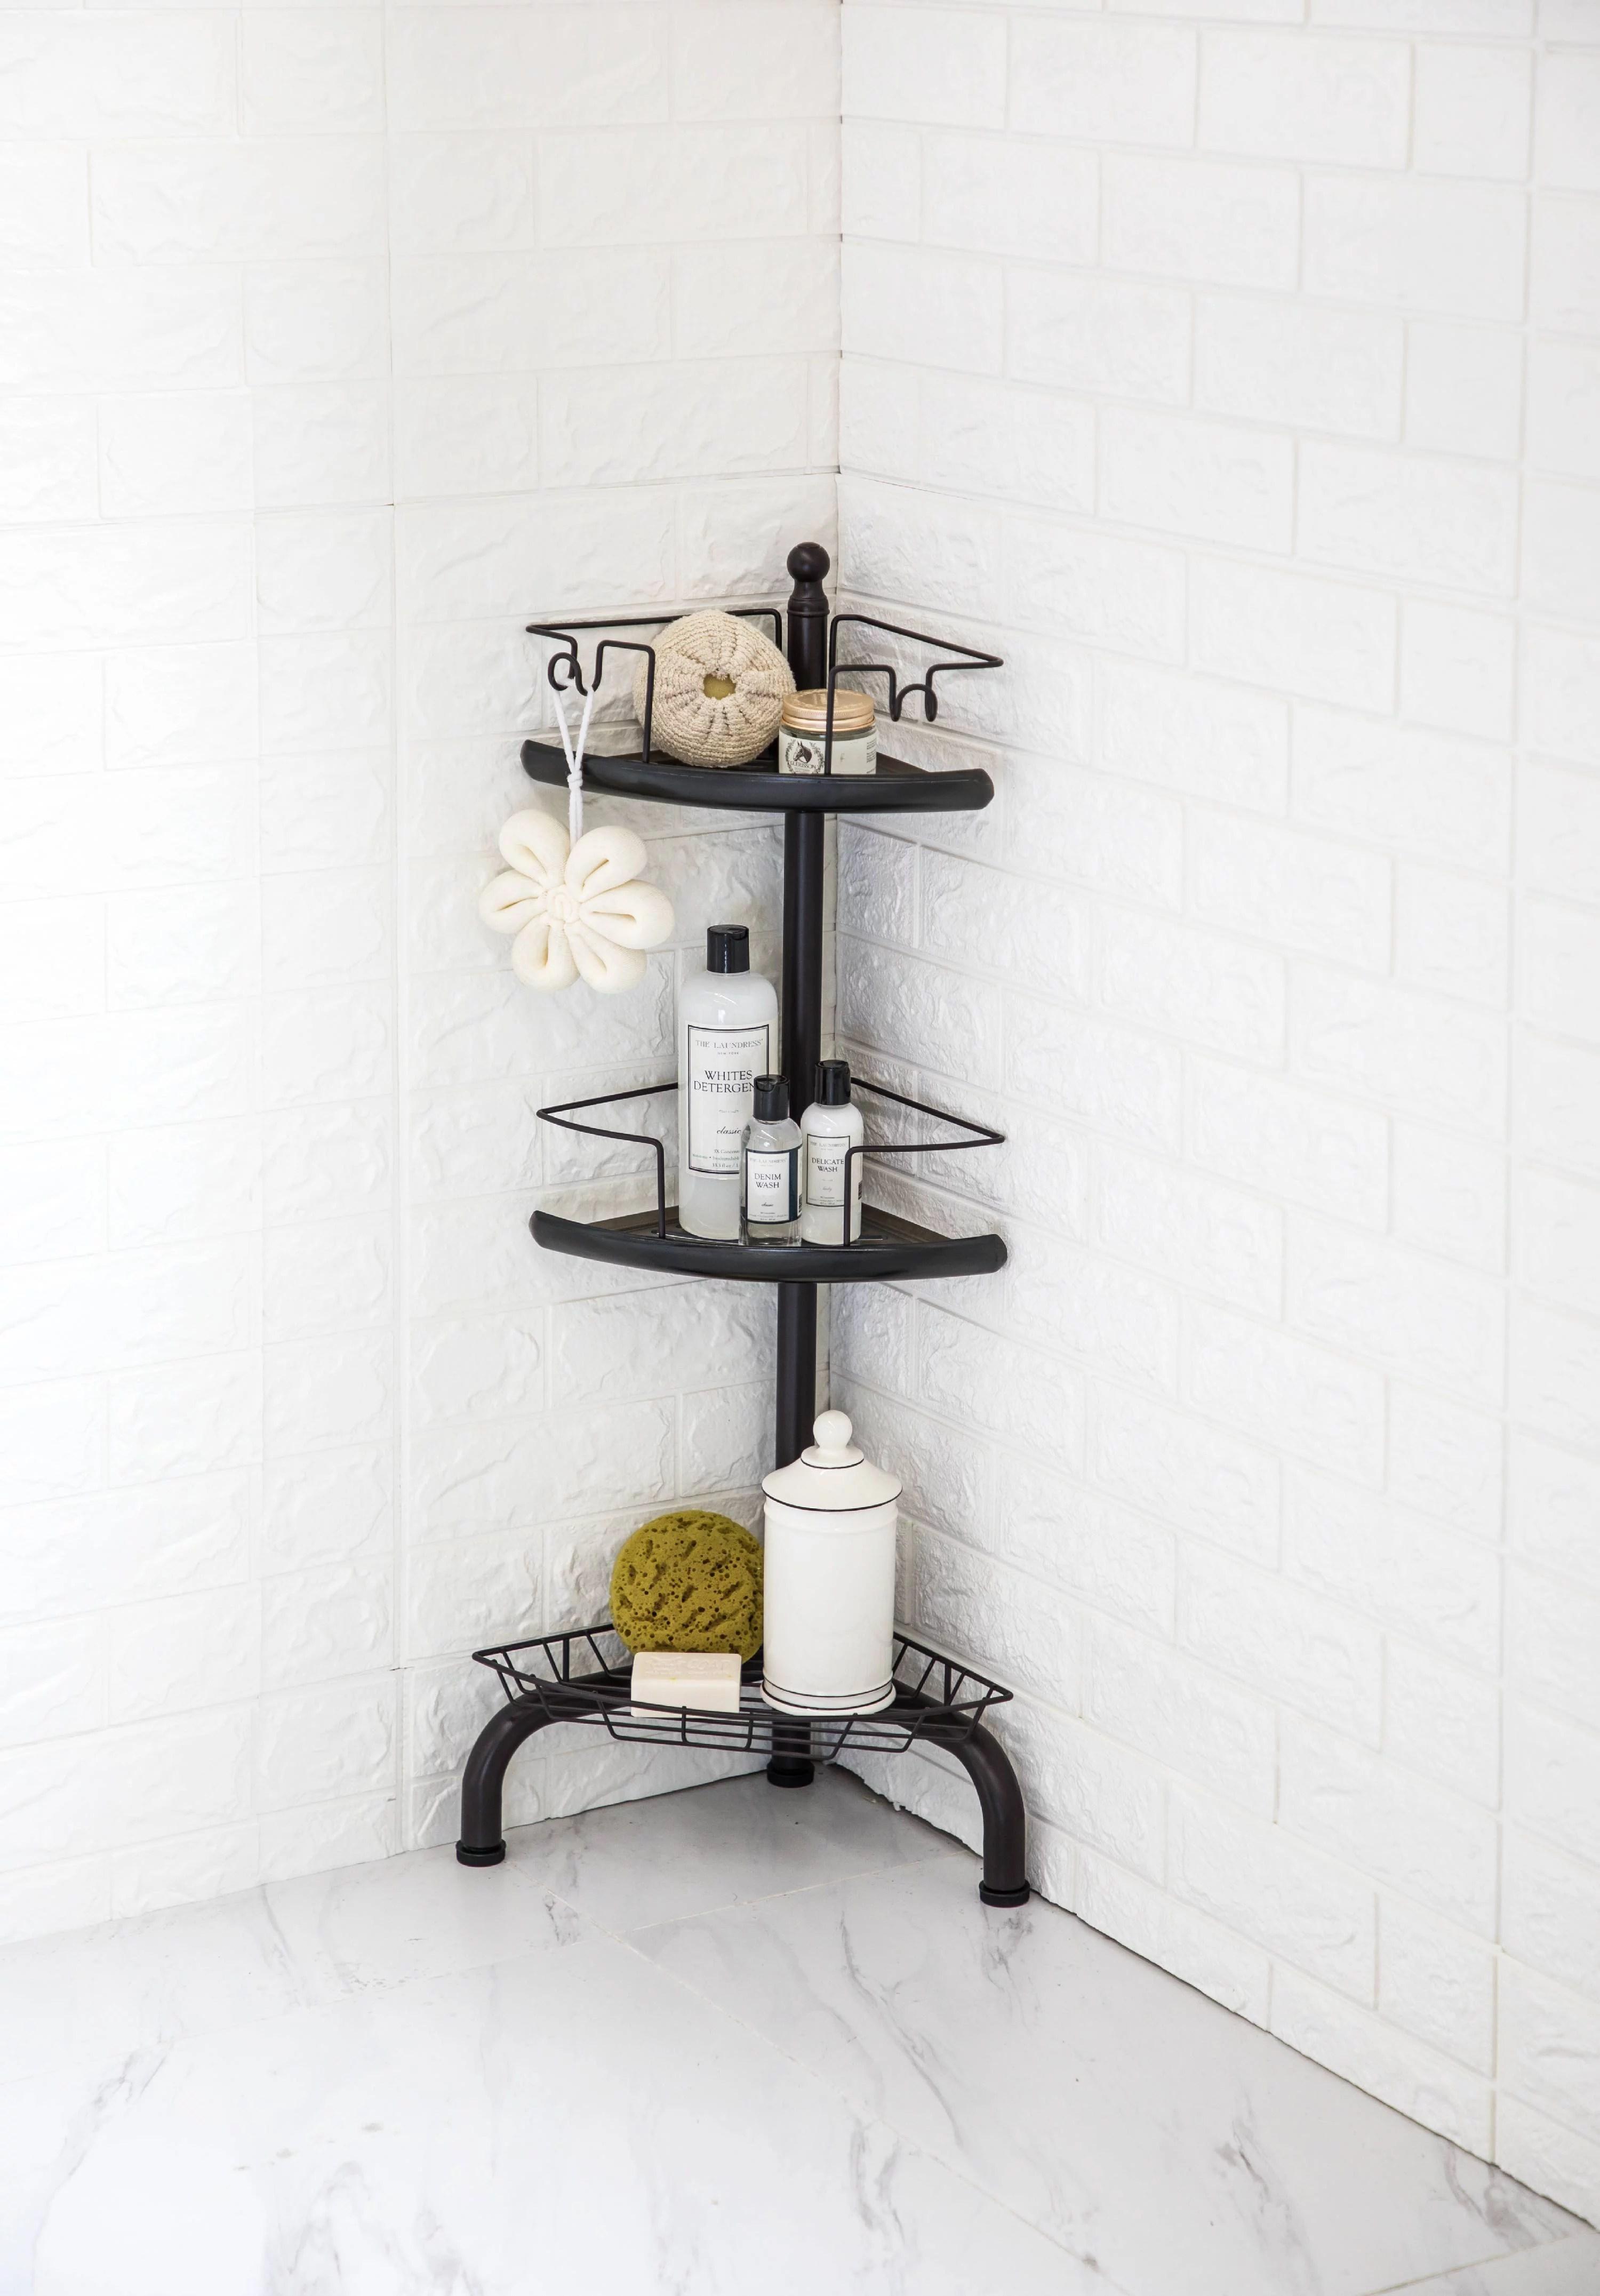 homezone 3 tier corner shower caddy with adjustable shelves oil rubbed bronze